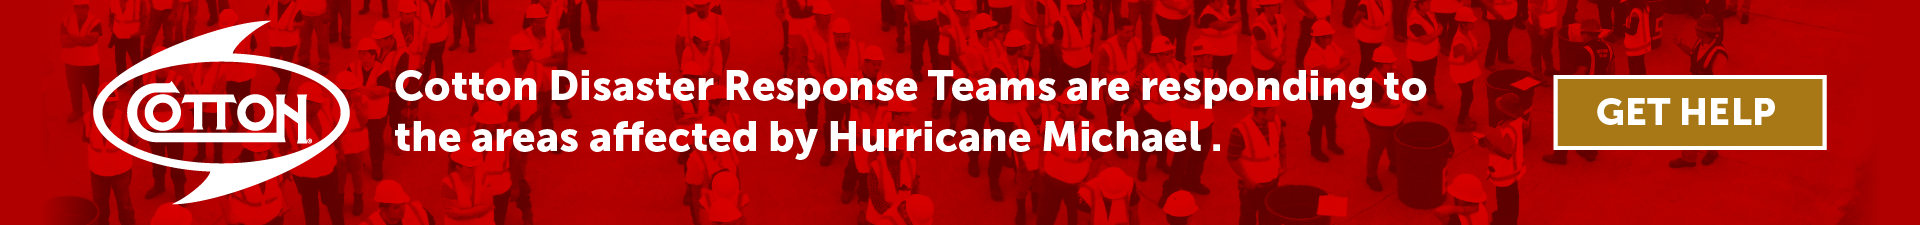 FY19_CAT_Hurricane_Michael_Homepage-Responding_Header_Mockup.png